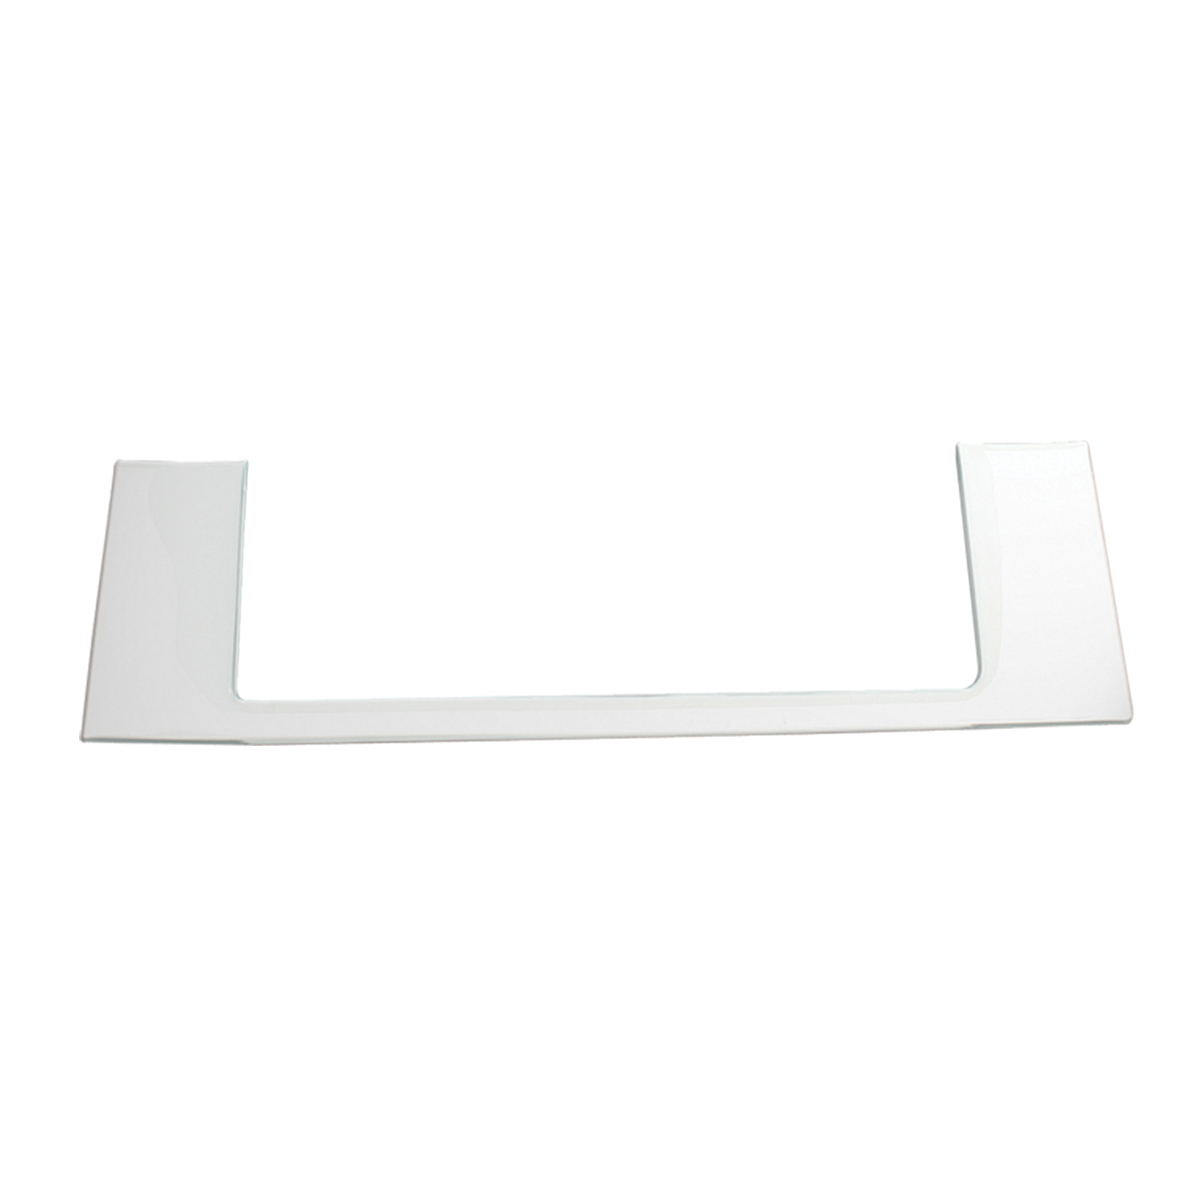 68915 KW Chrome Soft Plastic Top Compartment Trim